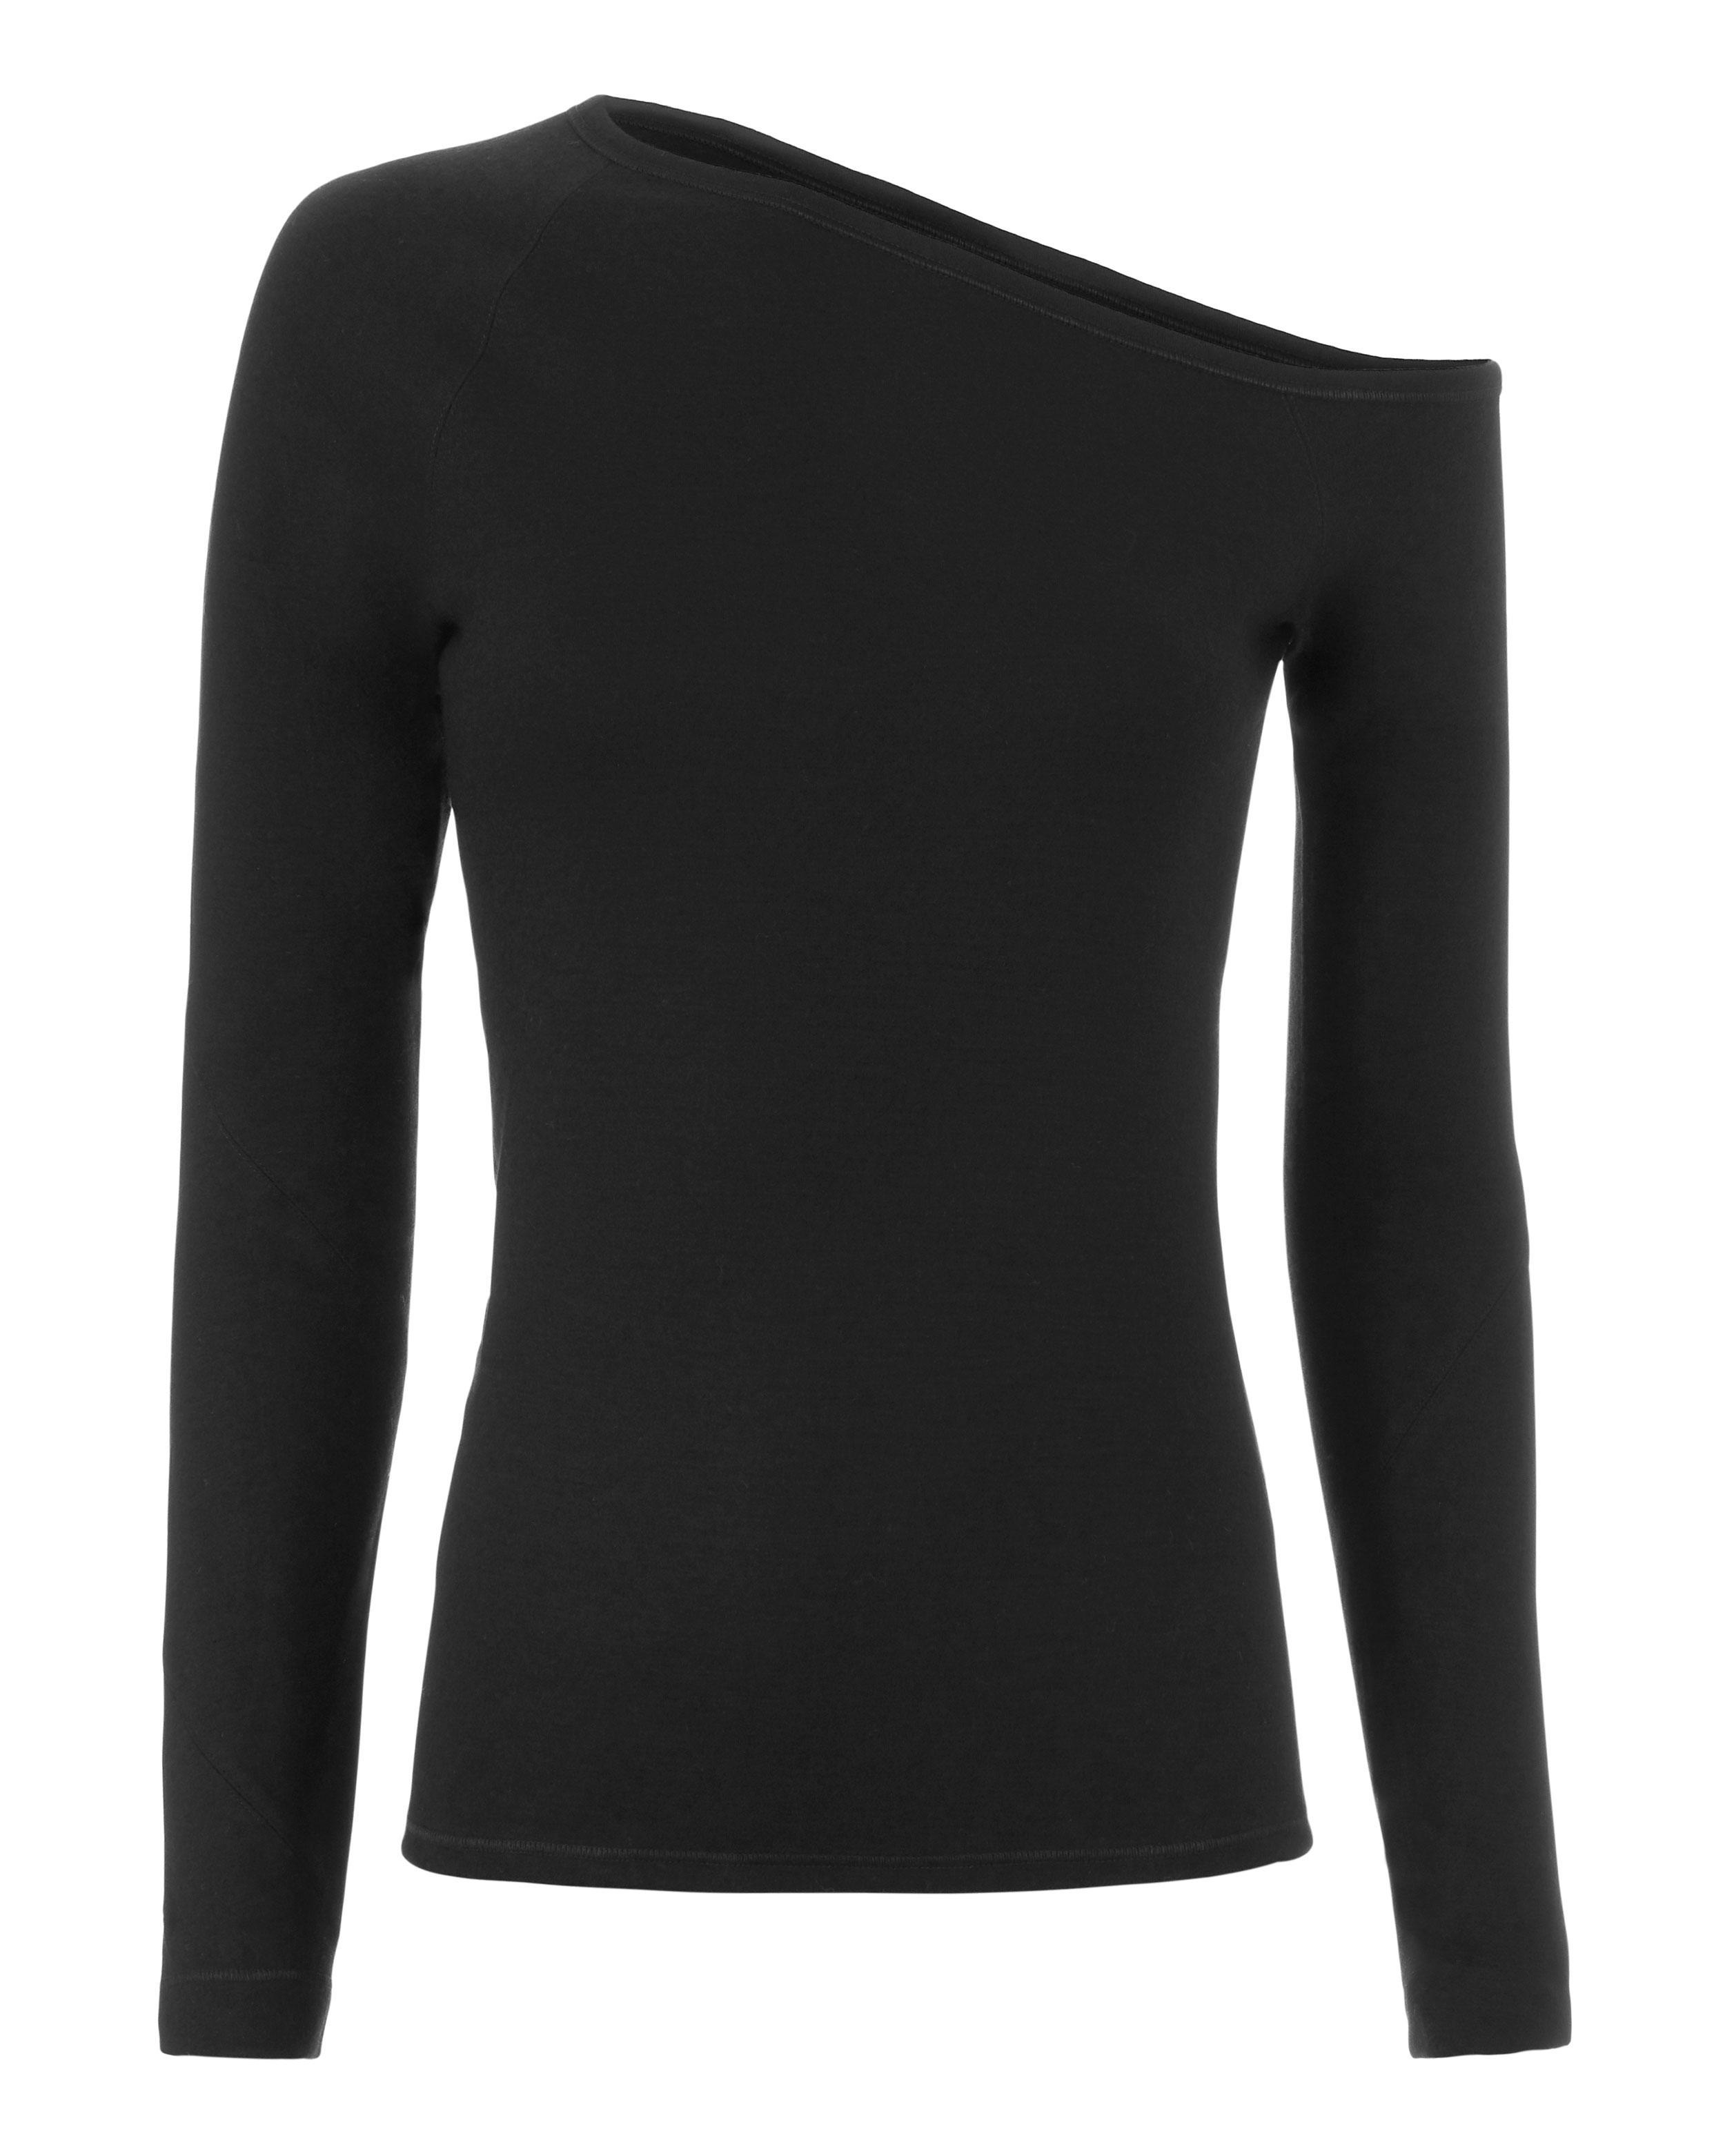 9d9f09d0e0f Helmut Lang Asymmetric Off Shoulder Top in Black - Lyst